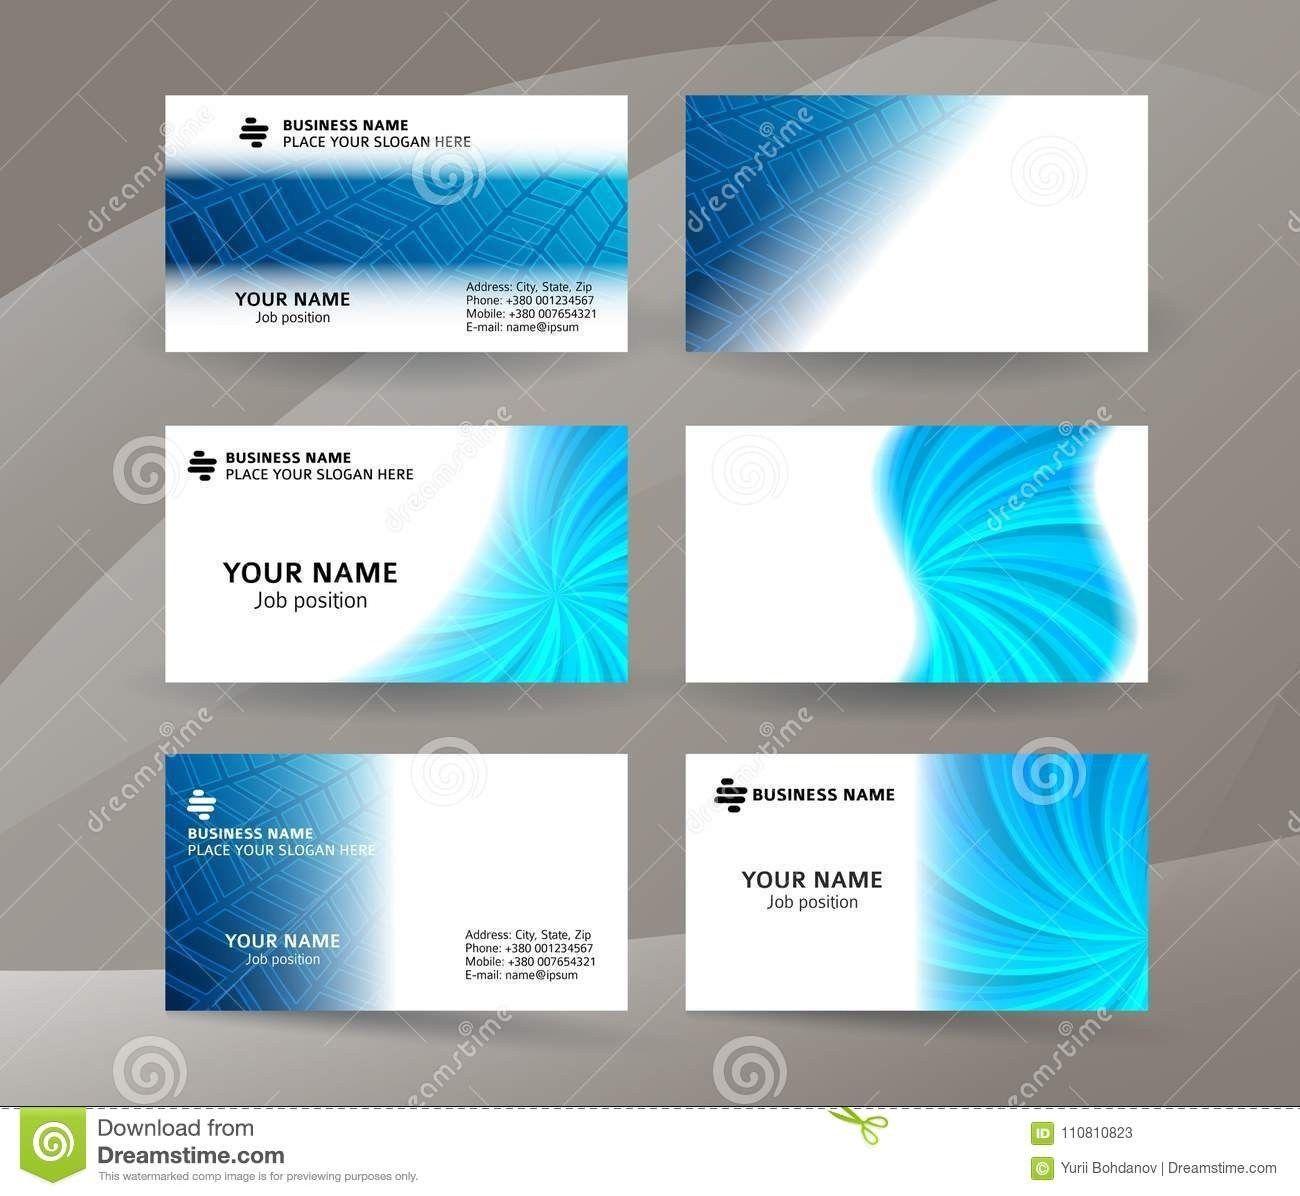 Business Card Background Design Printable Business Card Template Design Visiting Card Design Visiting Cards